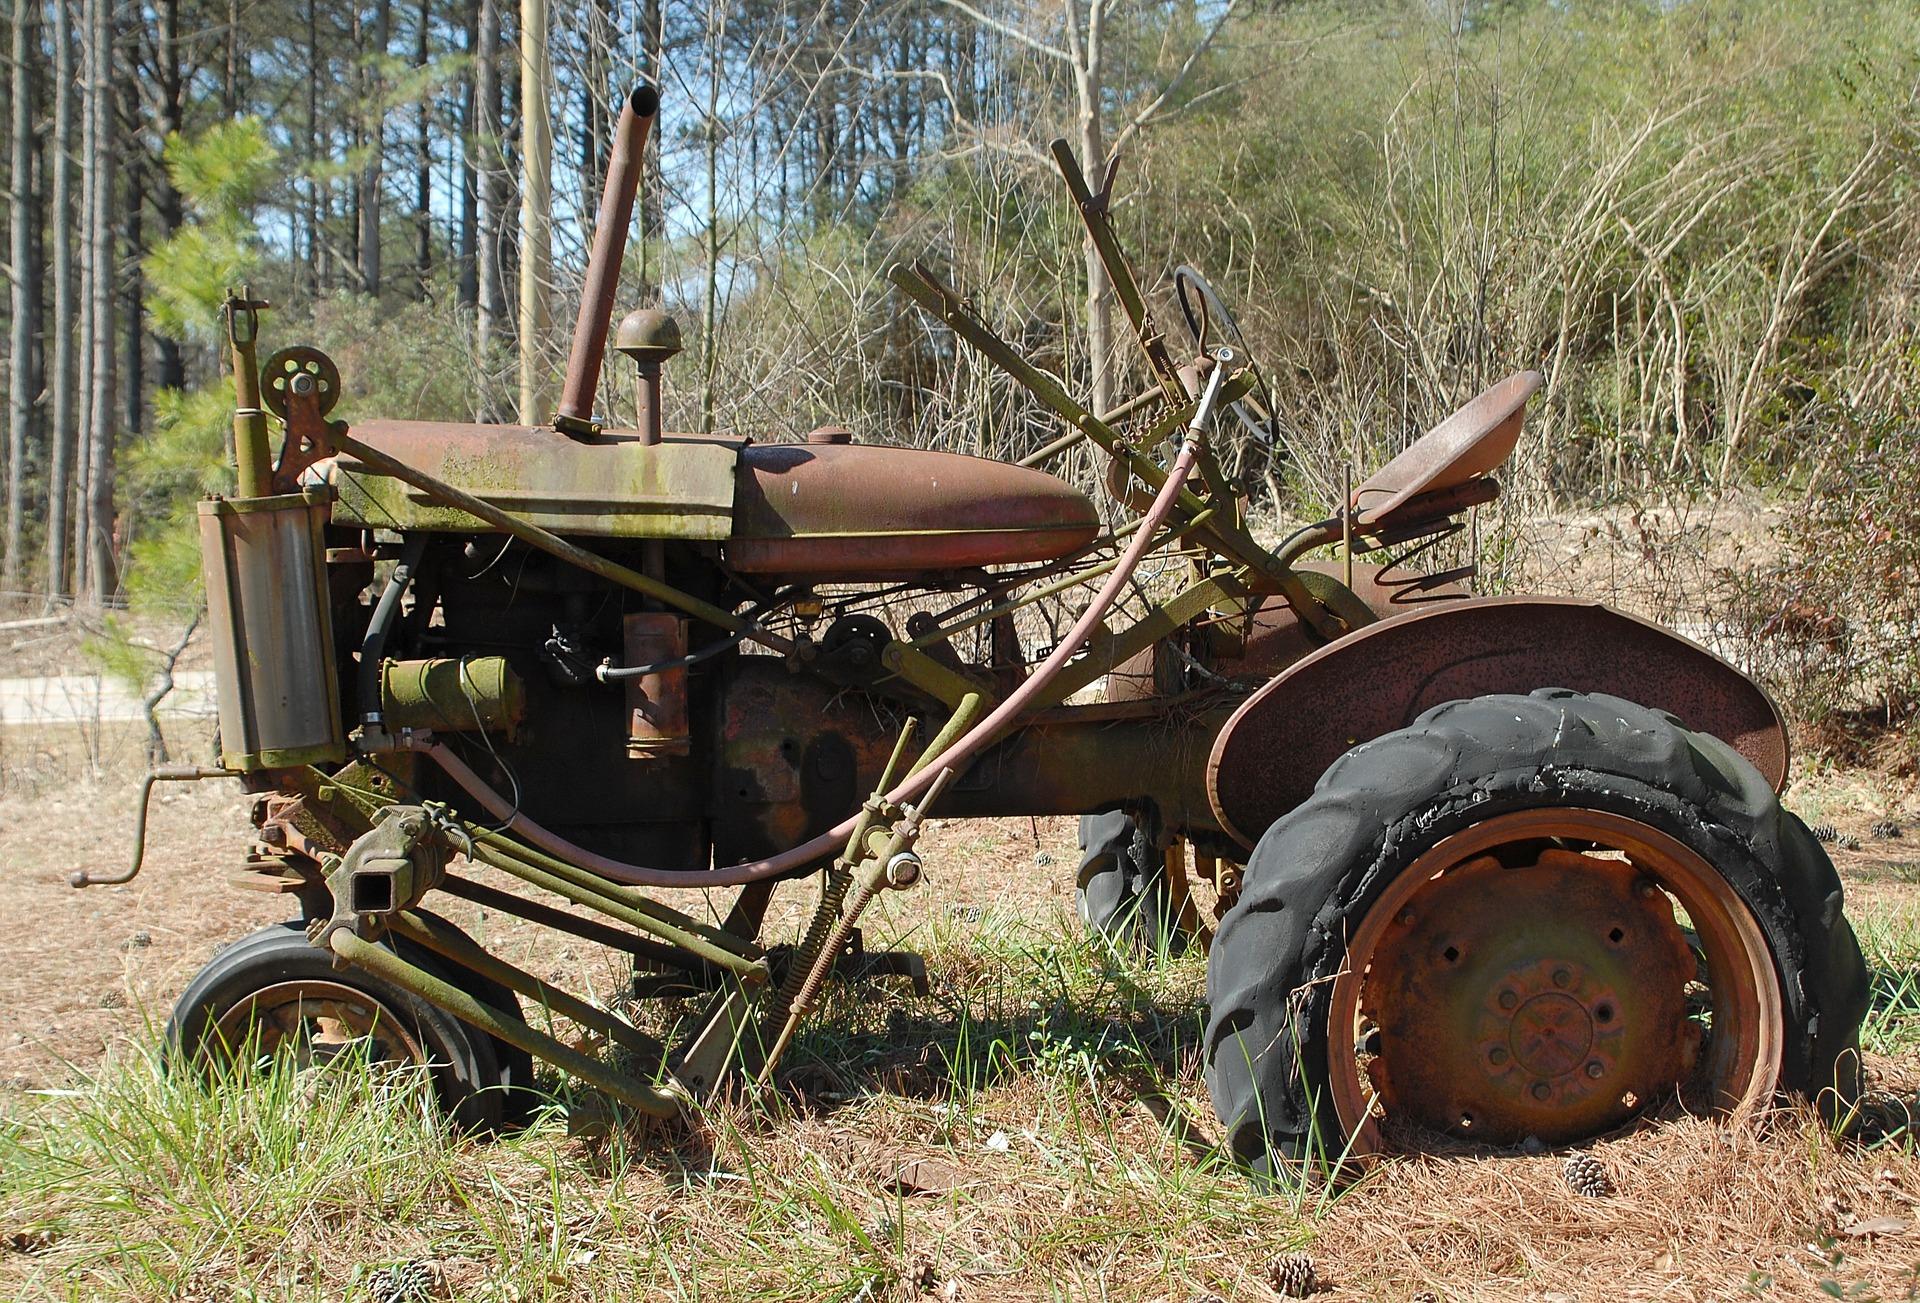 rusty-tractor-1633944_1920.jpg